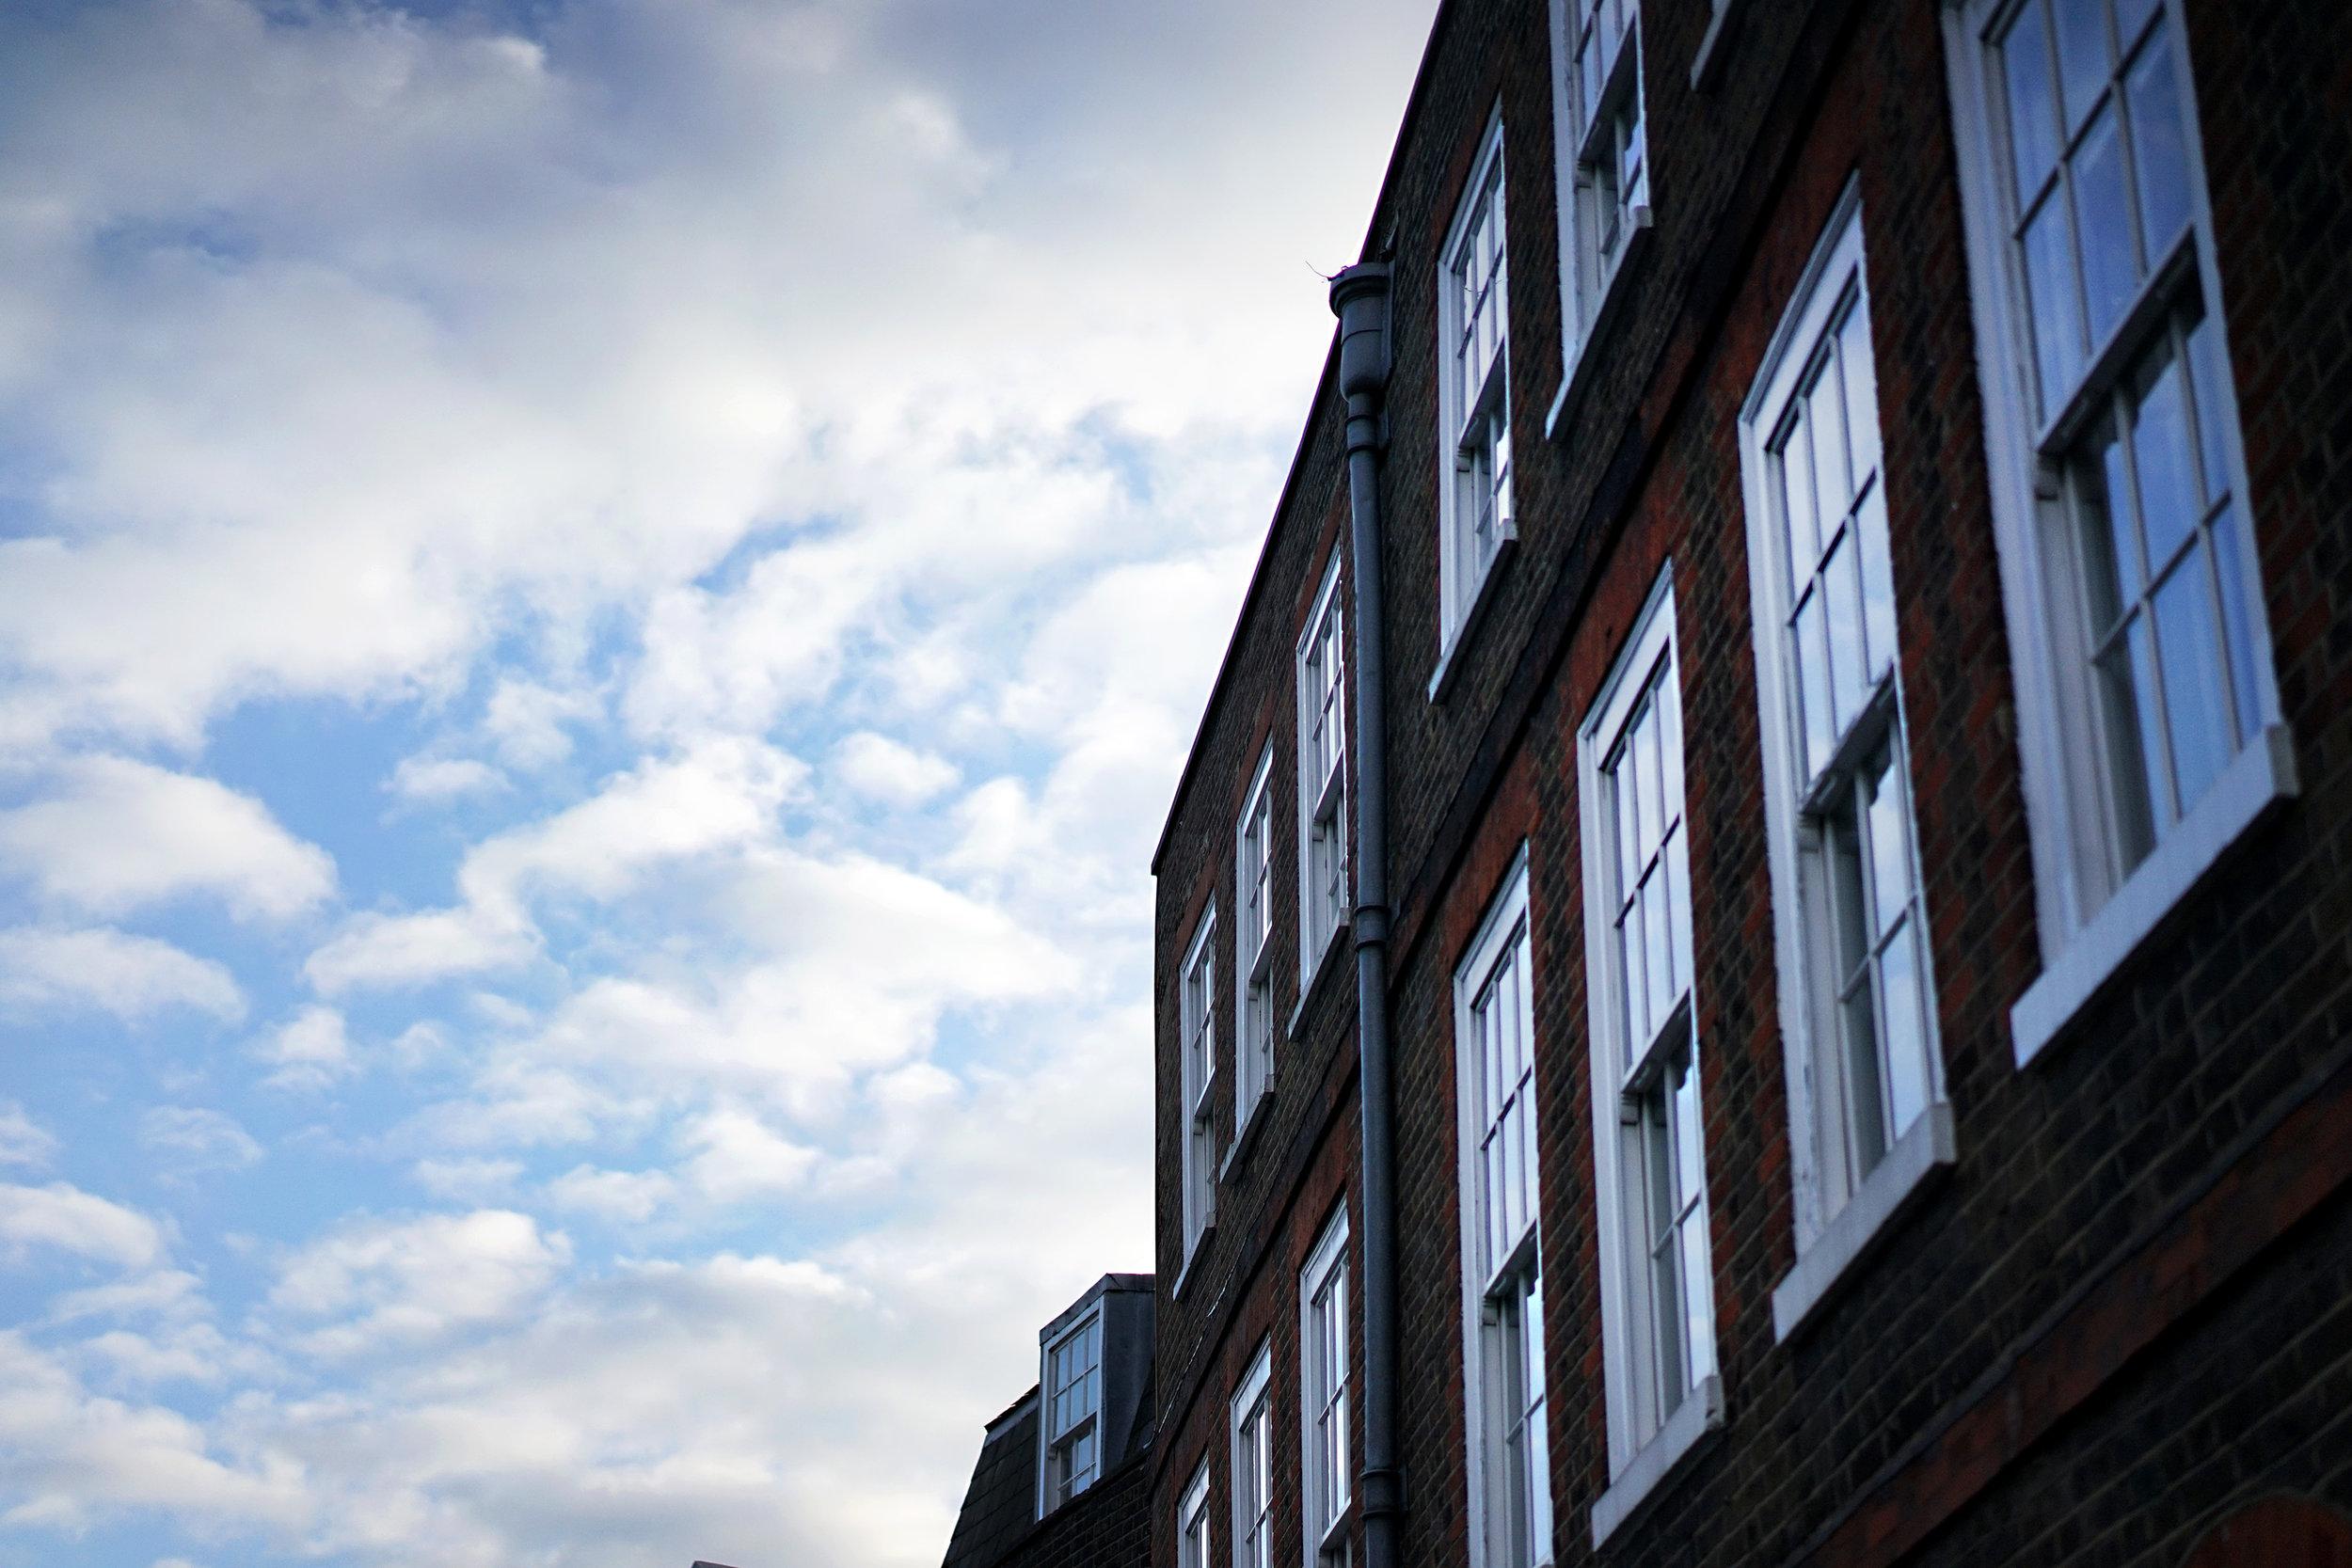 Fullers Exterior 013.jpg